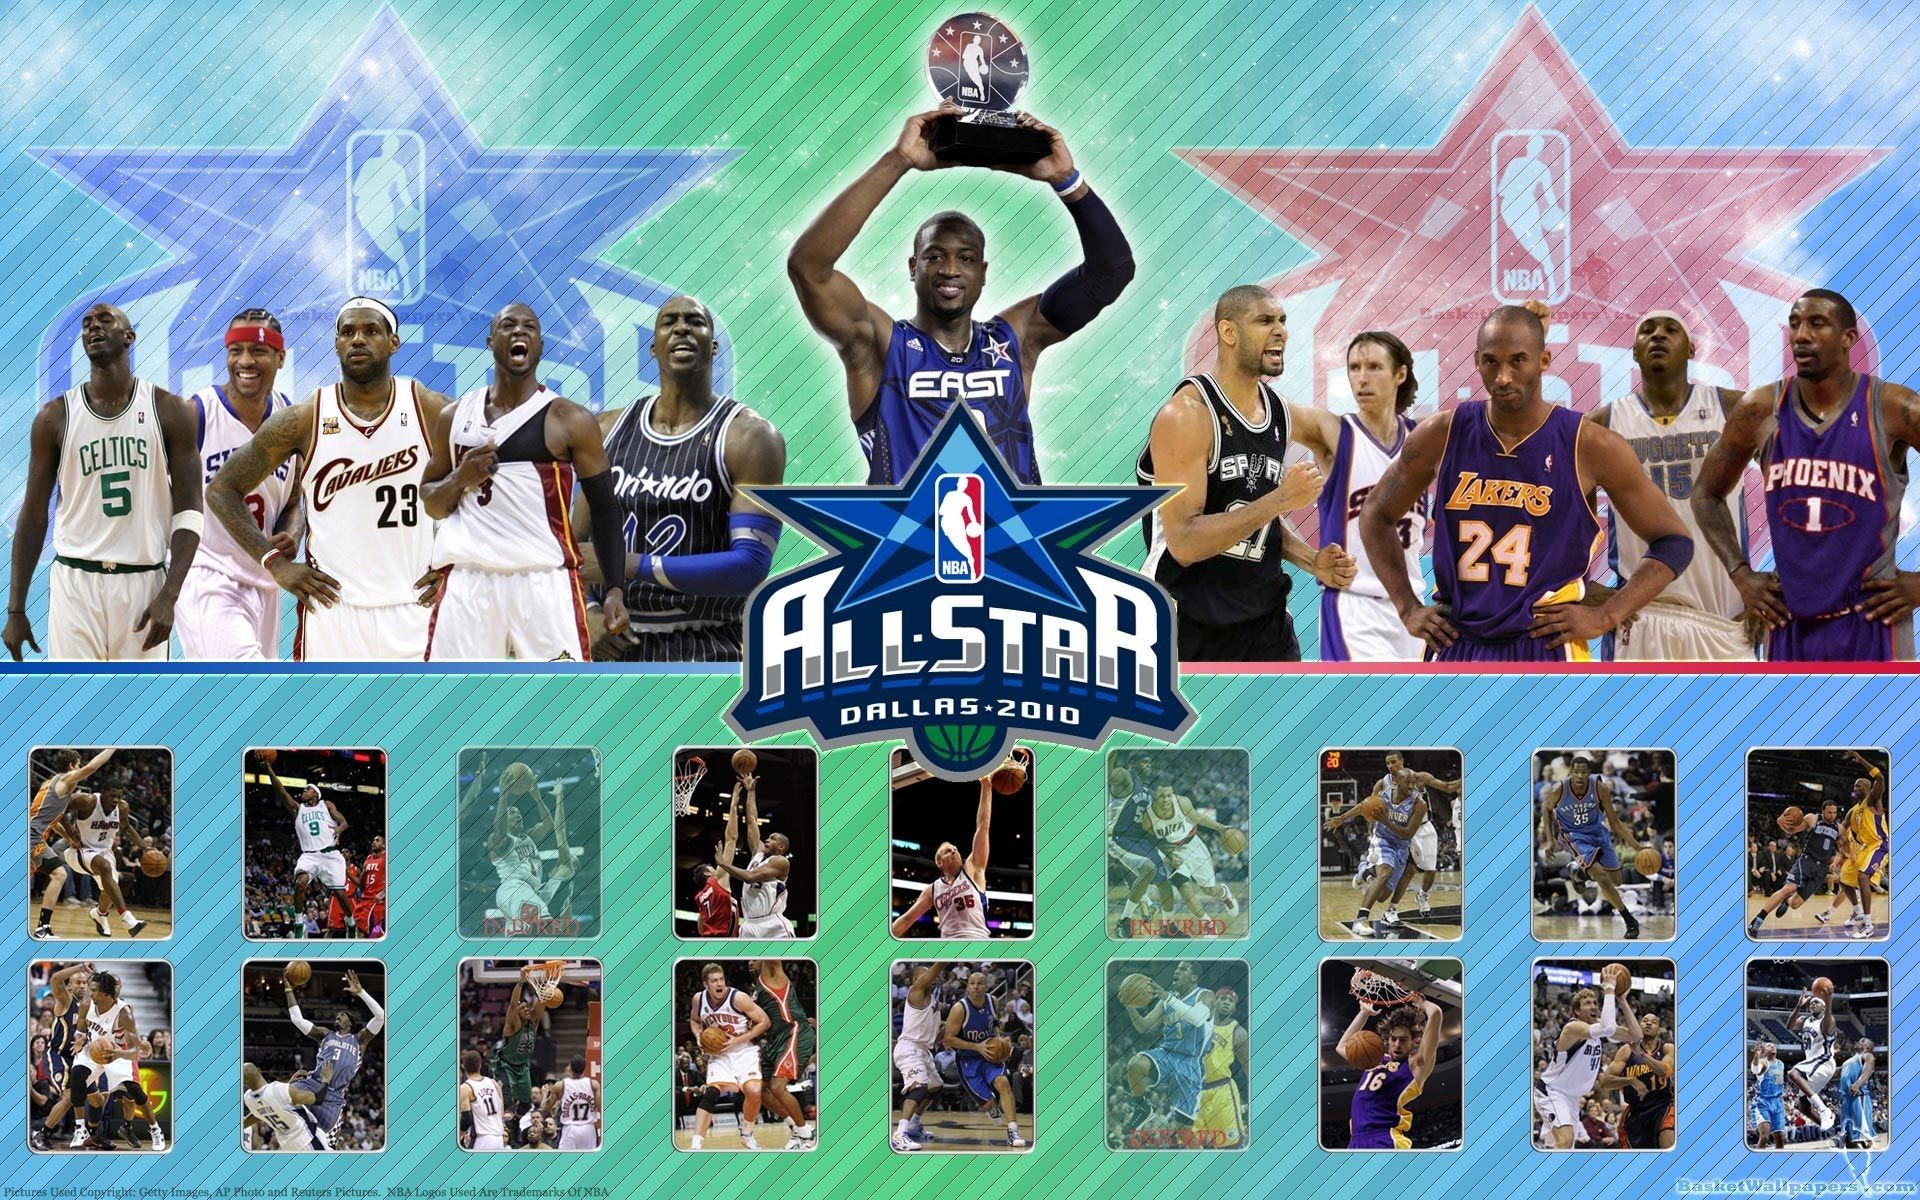 NBA K basketball sports action wallpaper 1920×1080 NBA 2K15 Wallpapers (50  Wallpapers)   Adorable Wallpapers   Desktop   Pinterest   NBA and Wallpaper